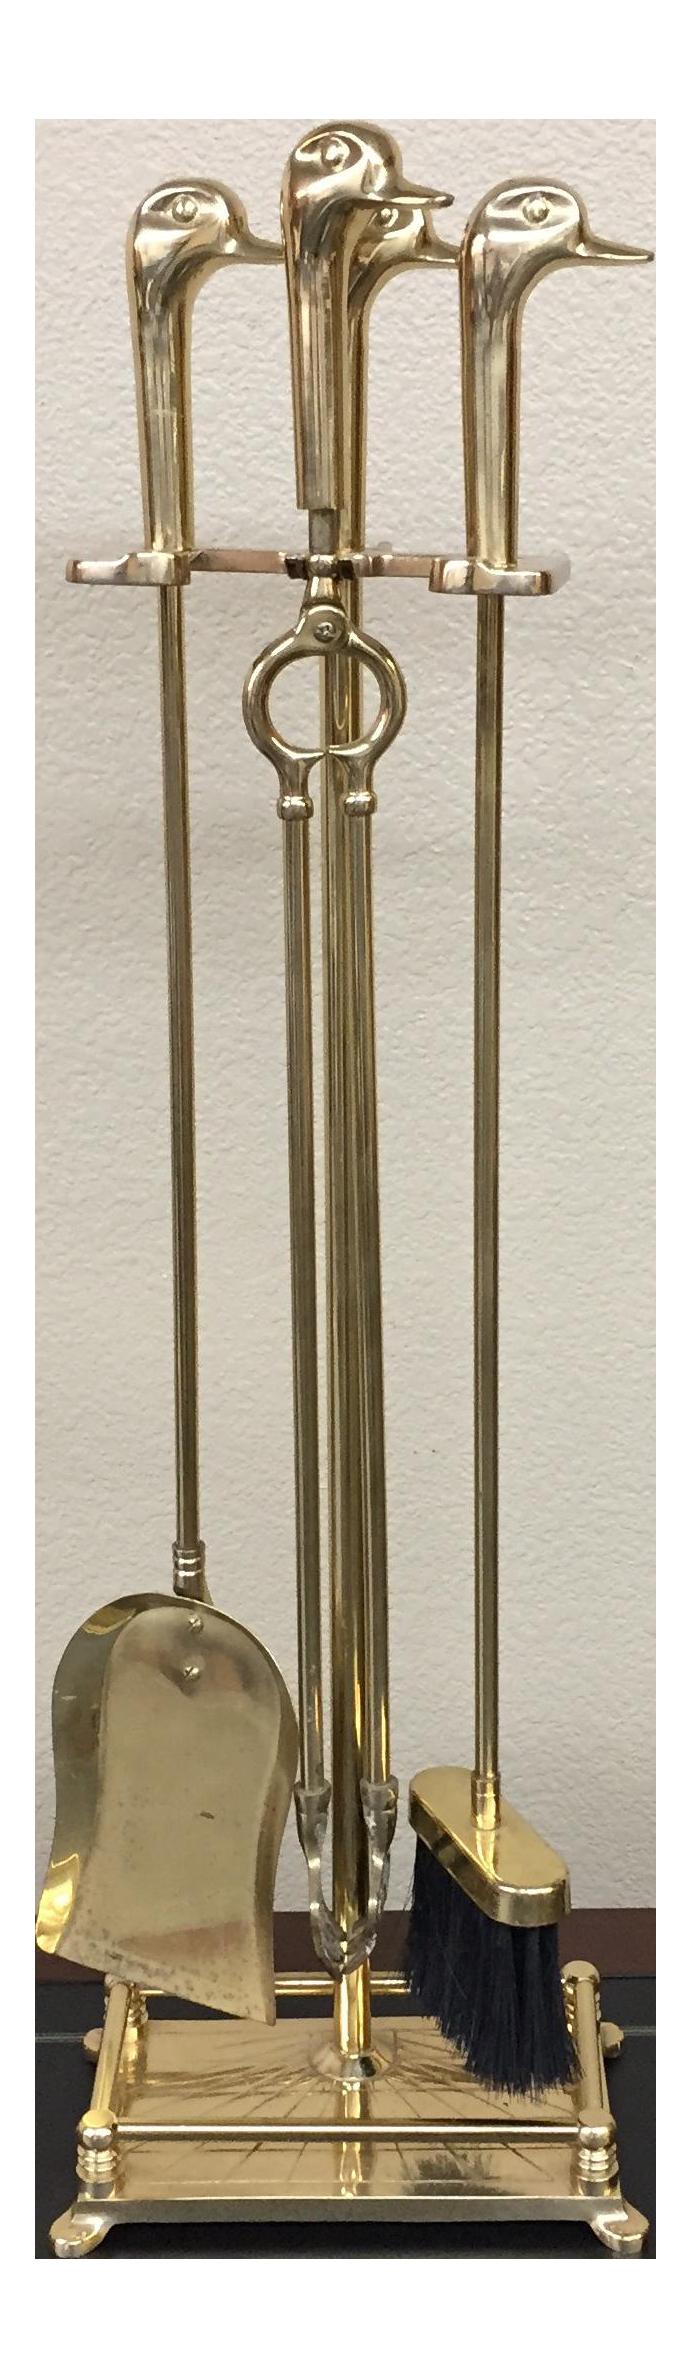 brass duck head fireplace tools set of 4 chairish